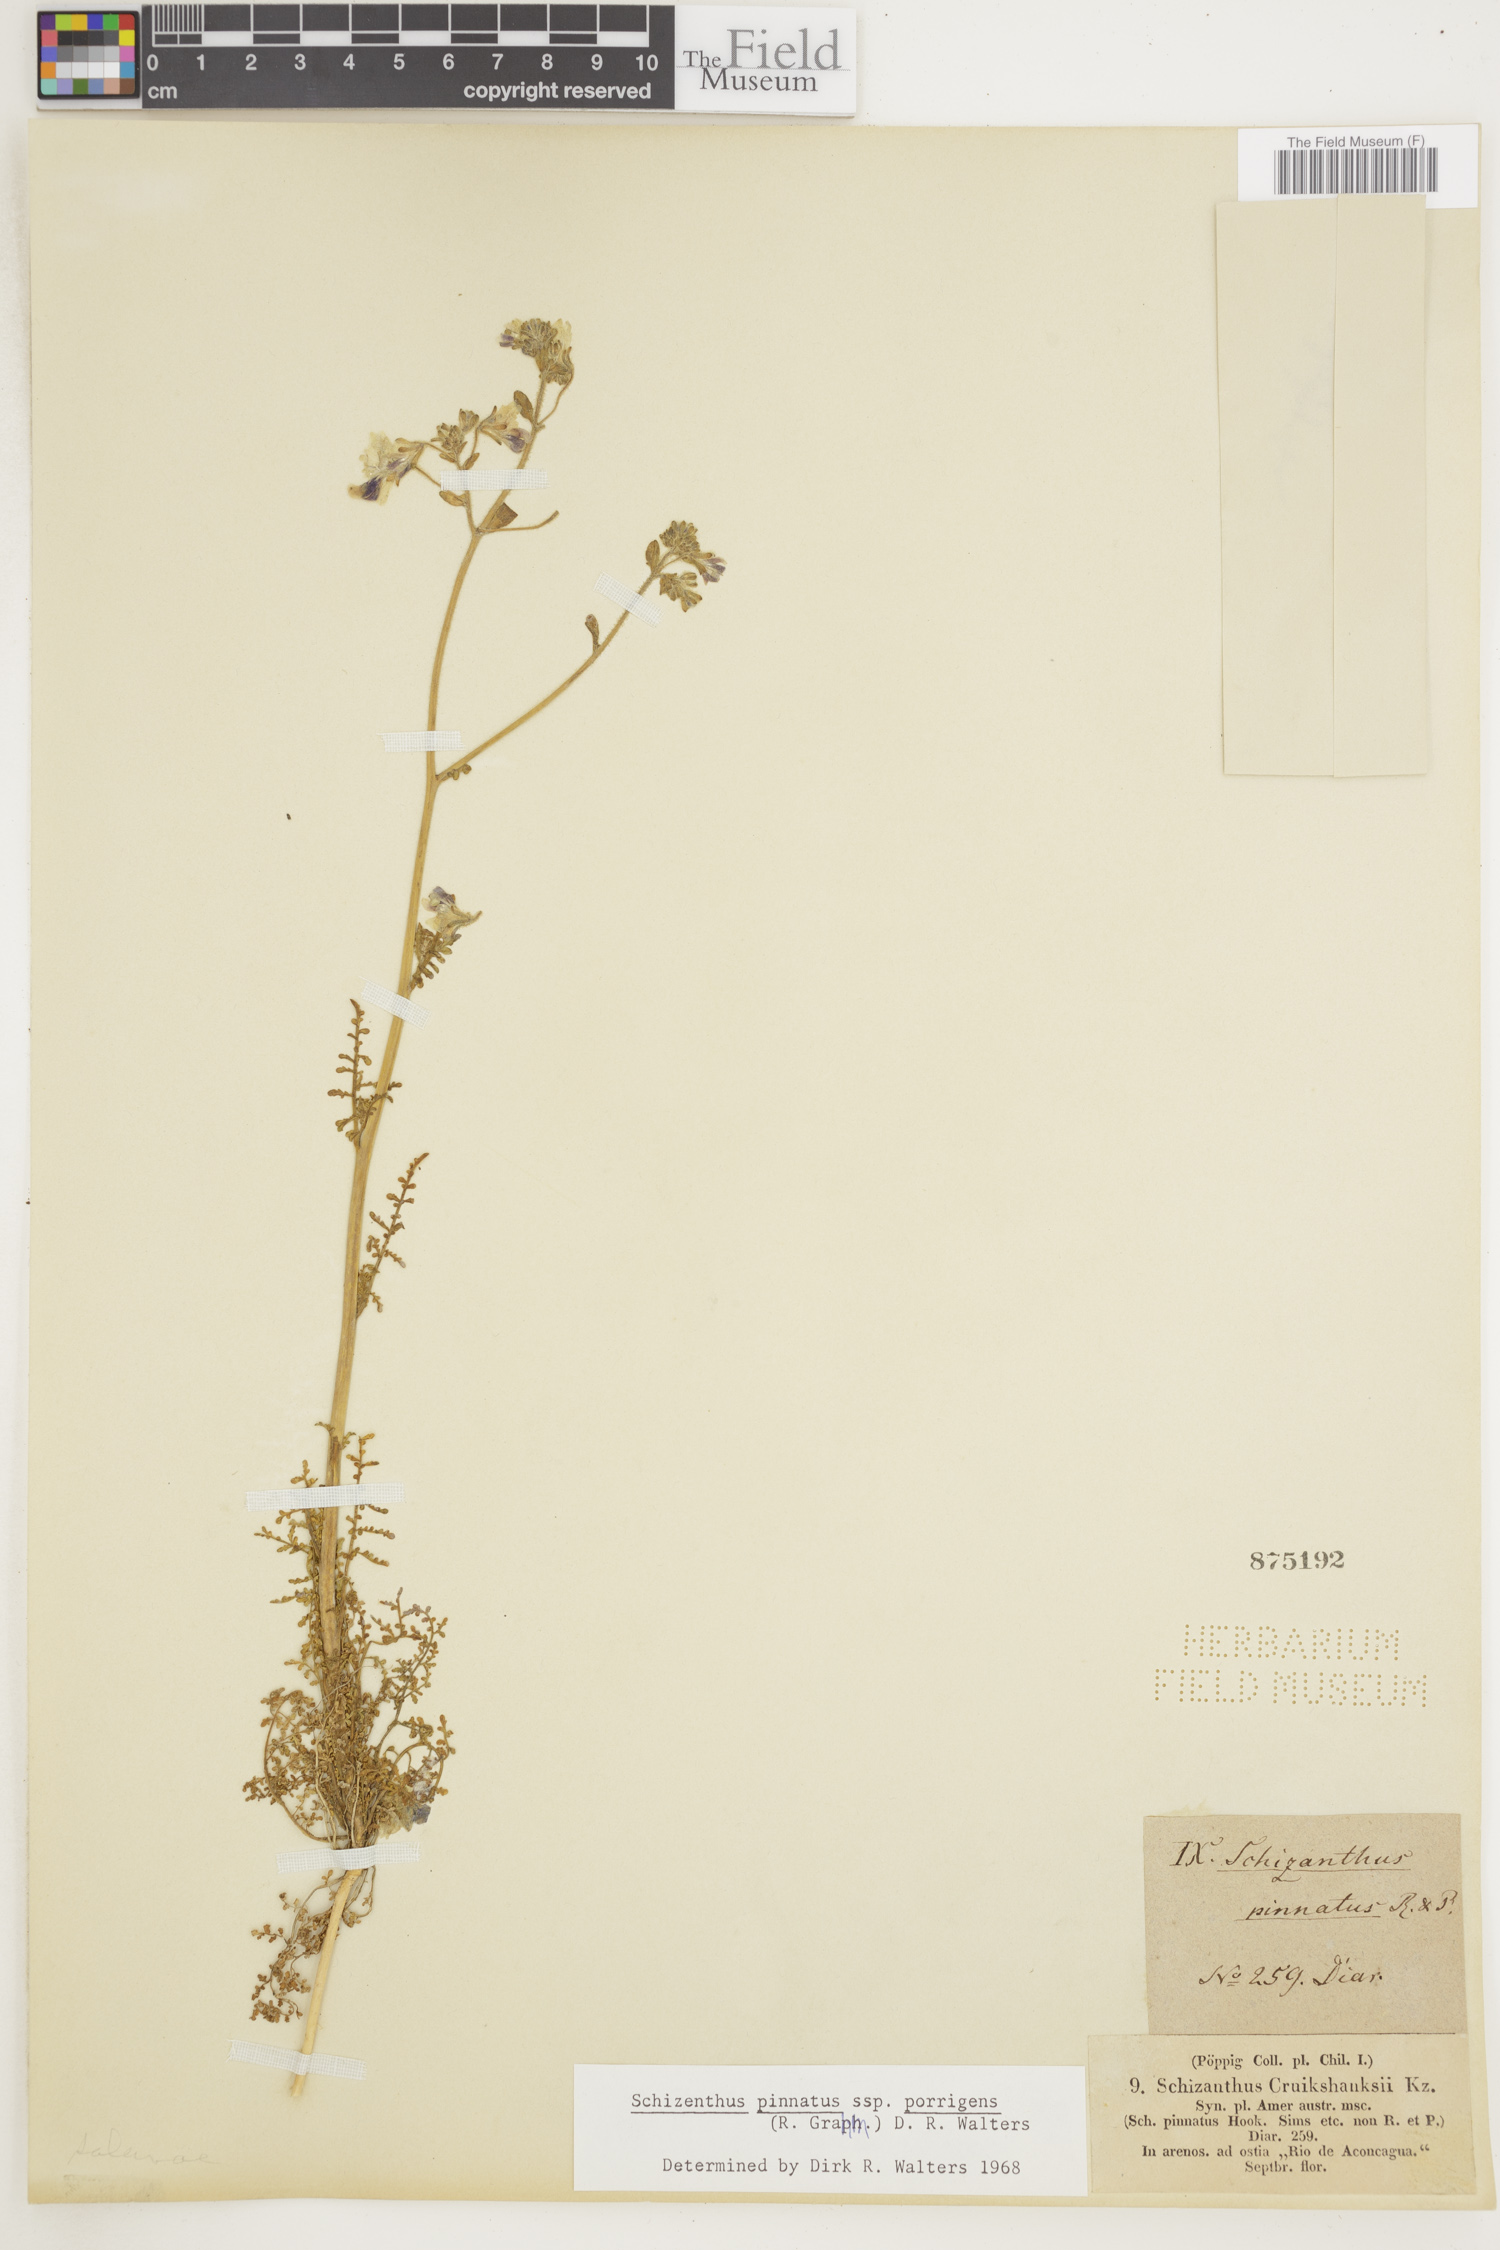 Schizanthus image